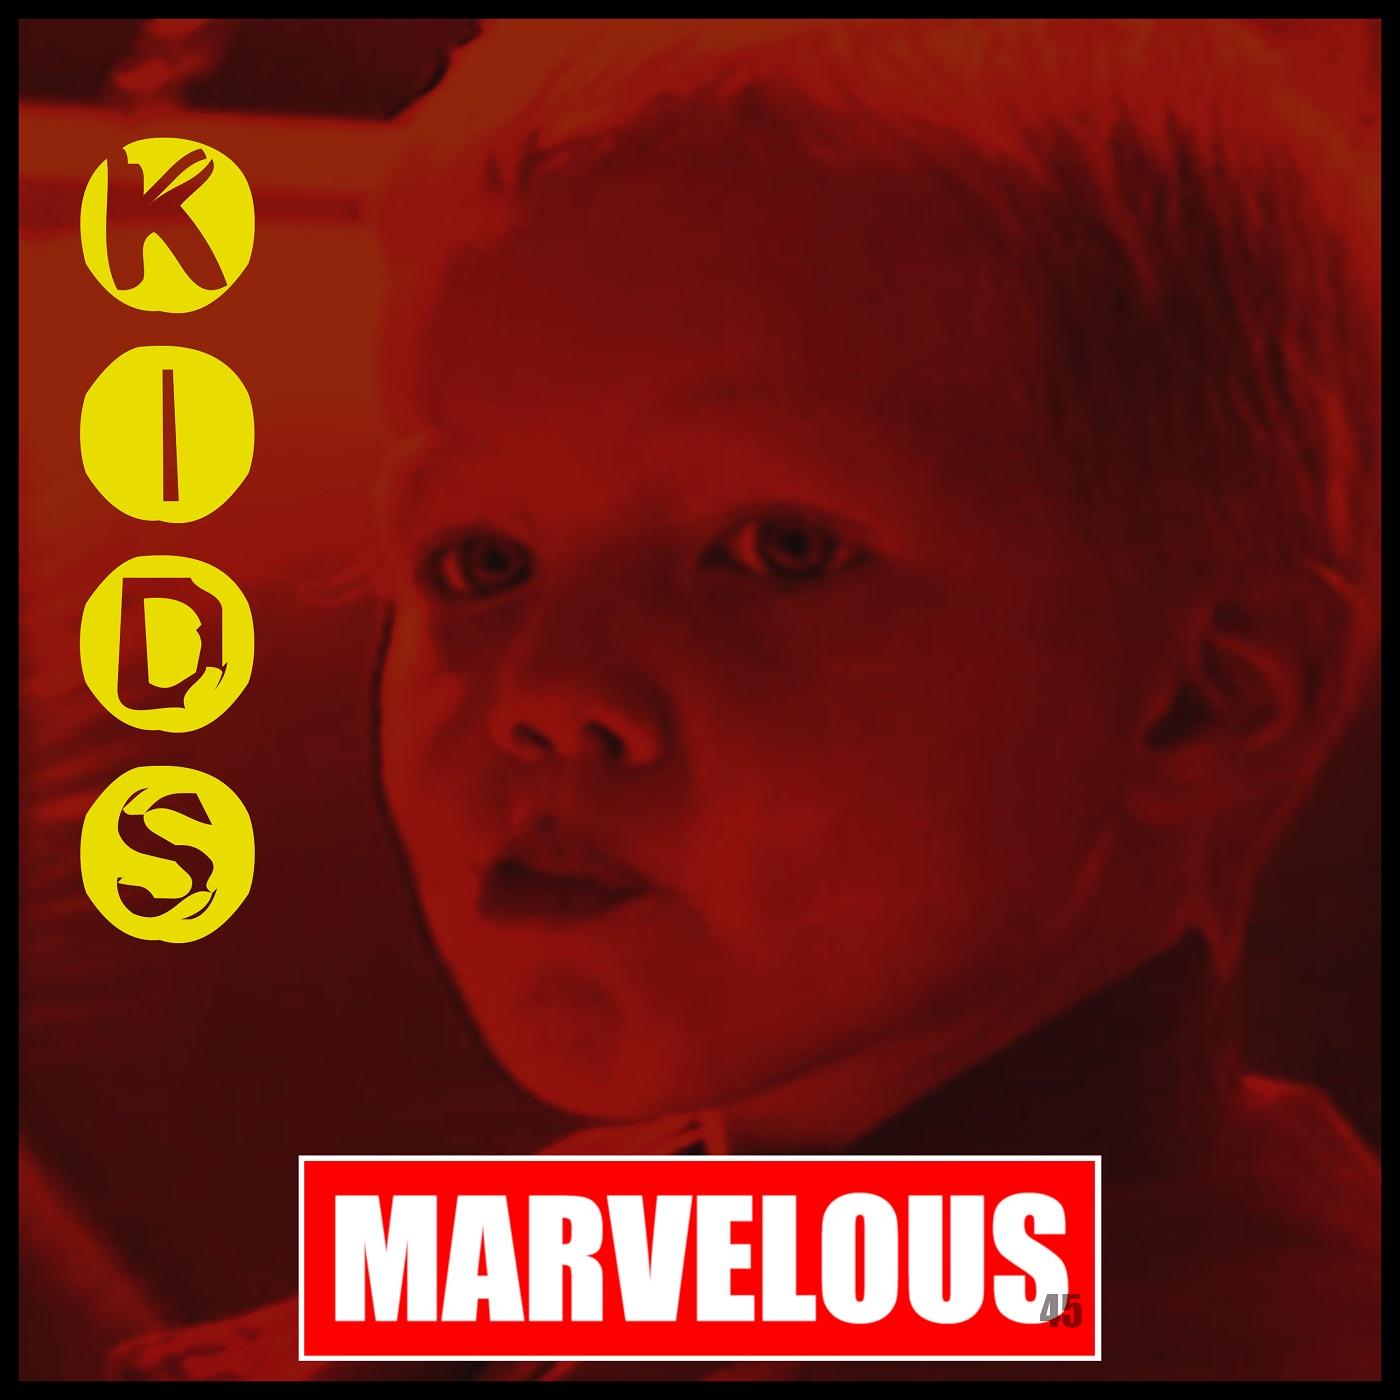 Upcoming: Marvelous - Kids